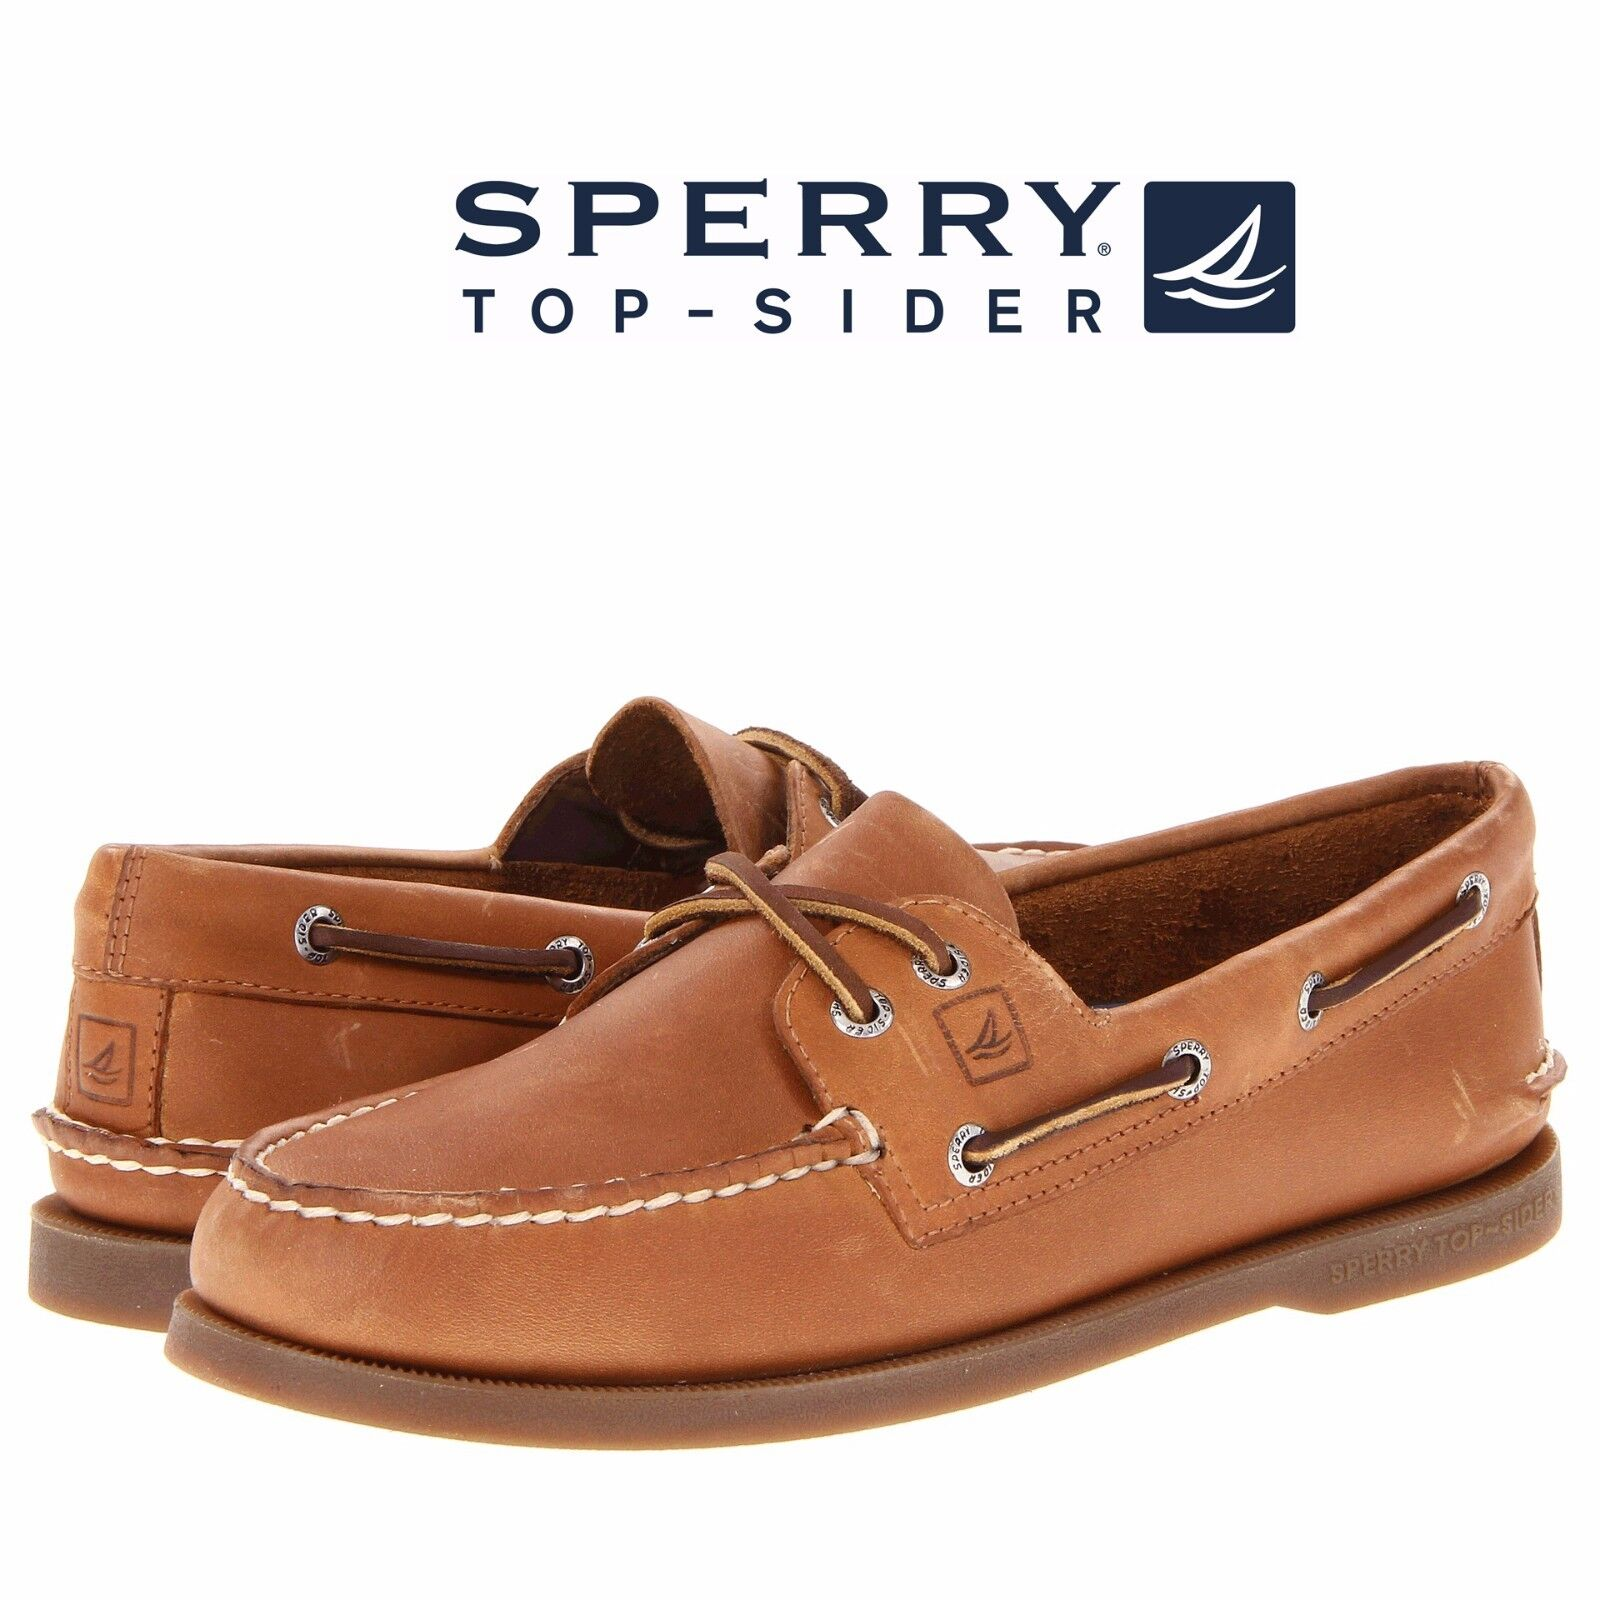 O 2-Eye Boat Shoes Sahara Leather